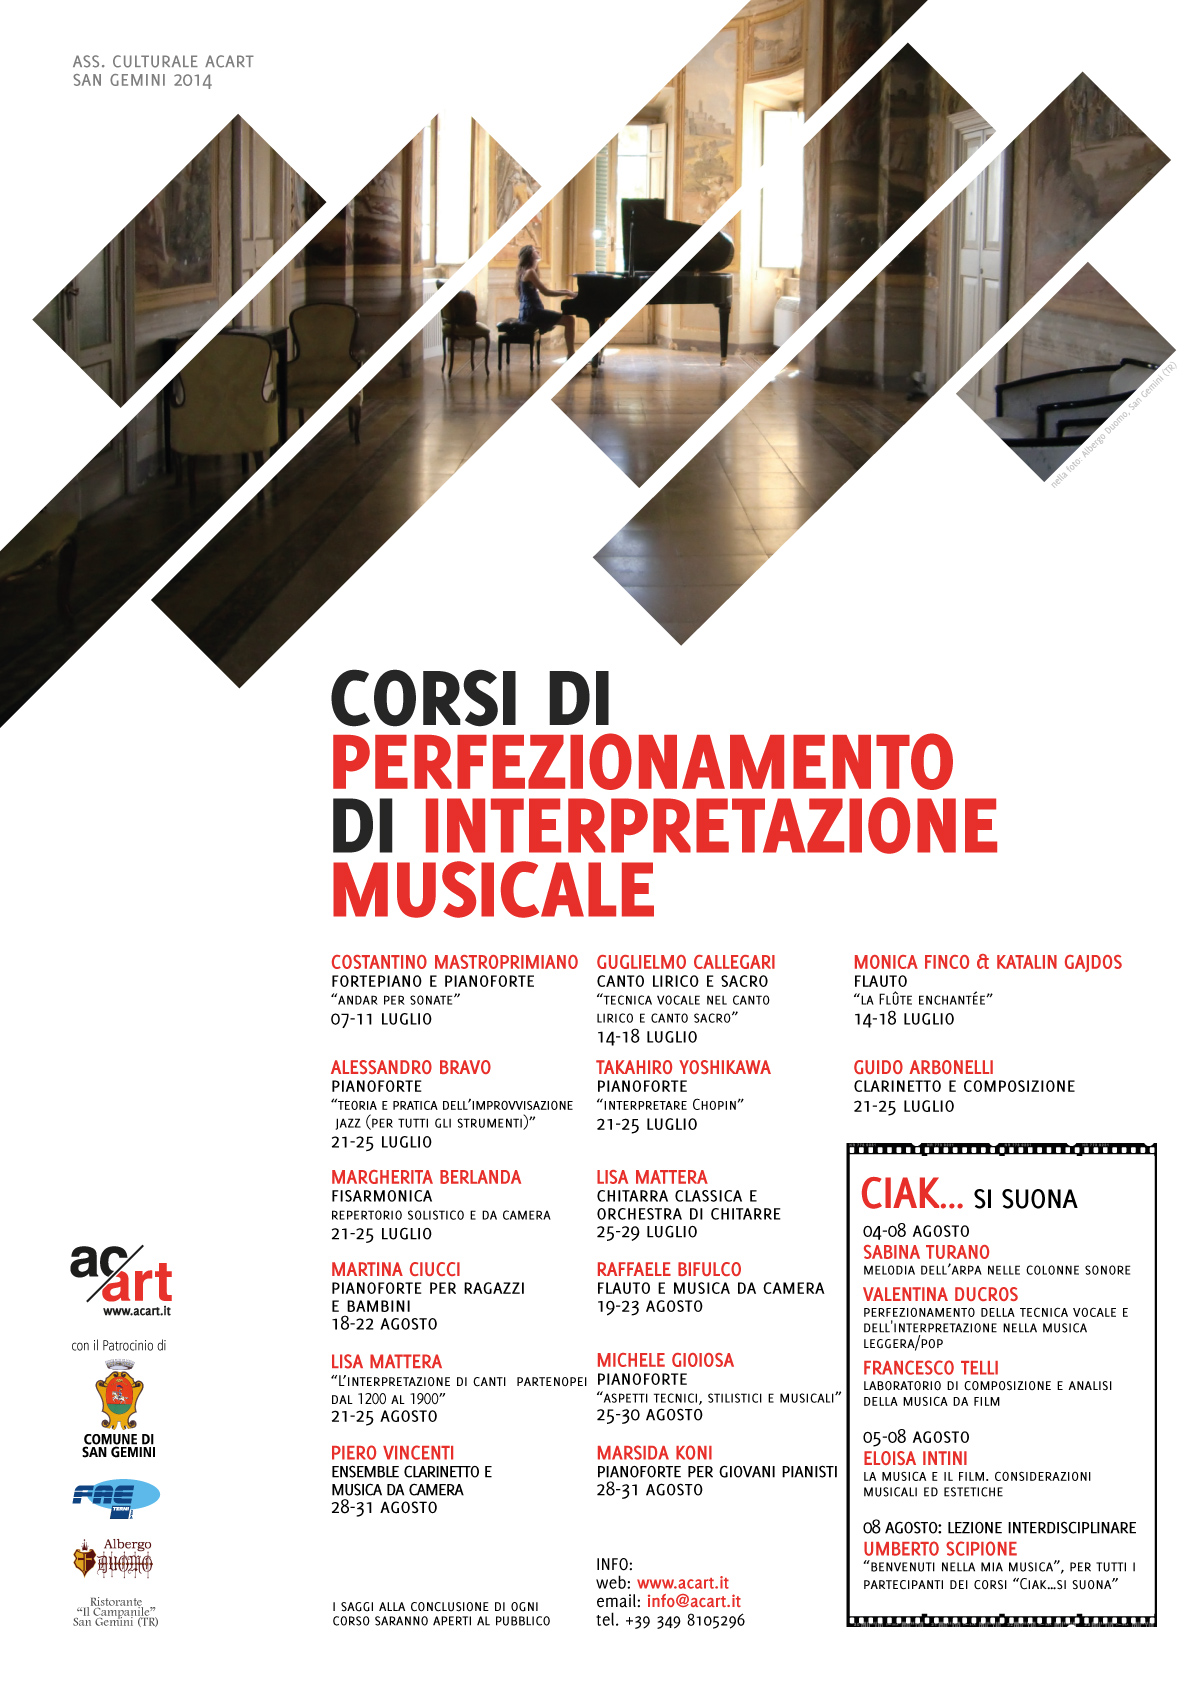 021C_2014_AcArt_manifesto_corsi_2014_WEB